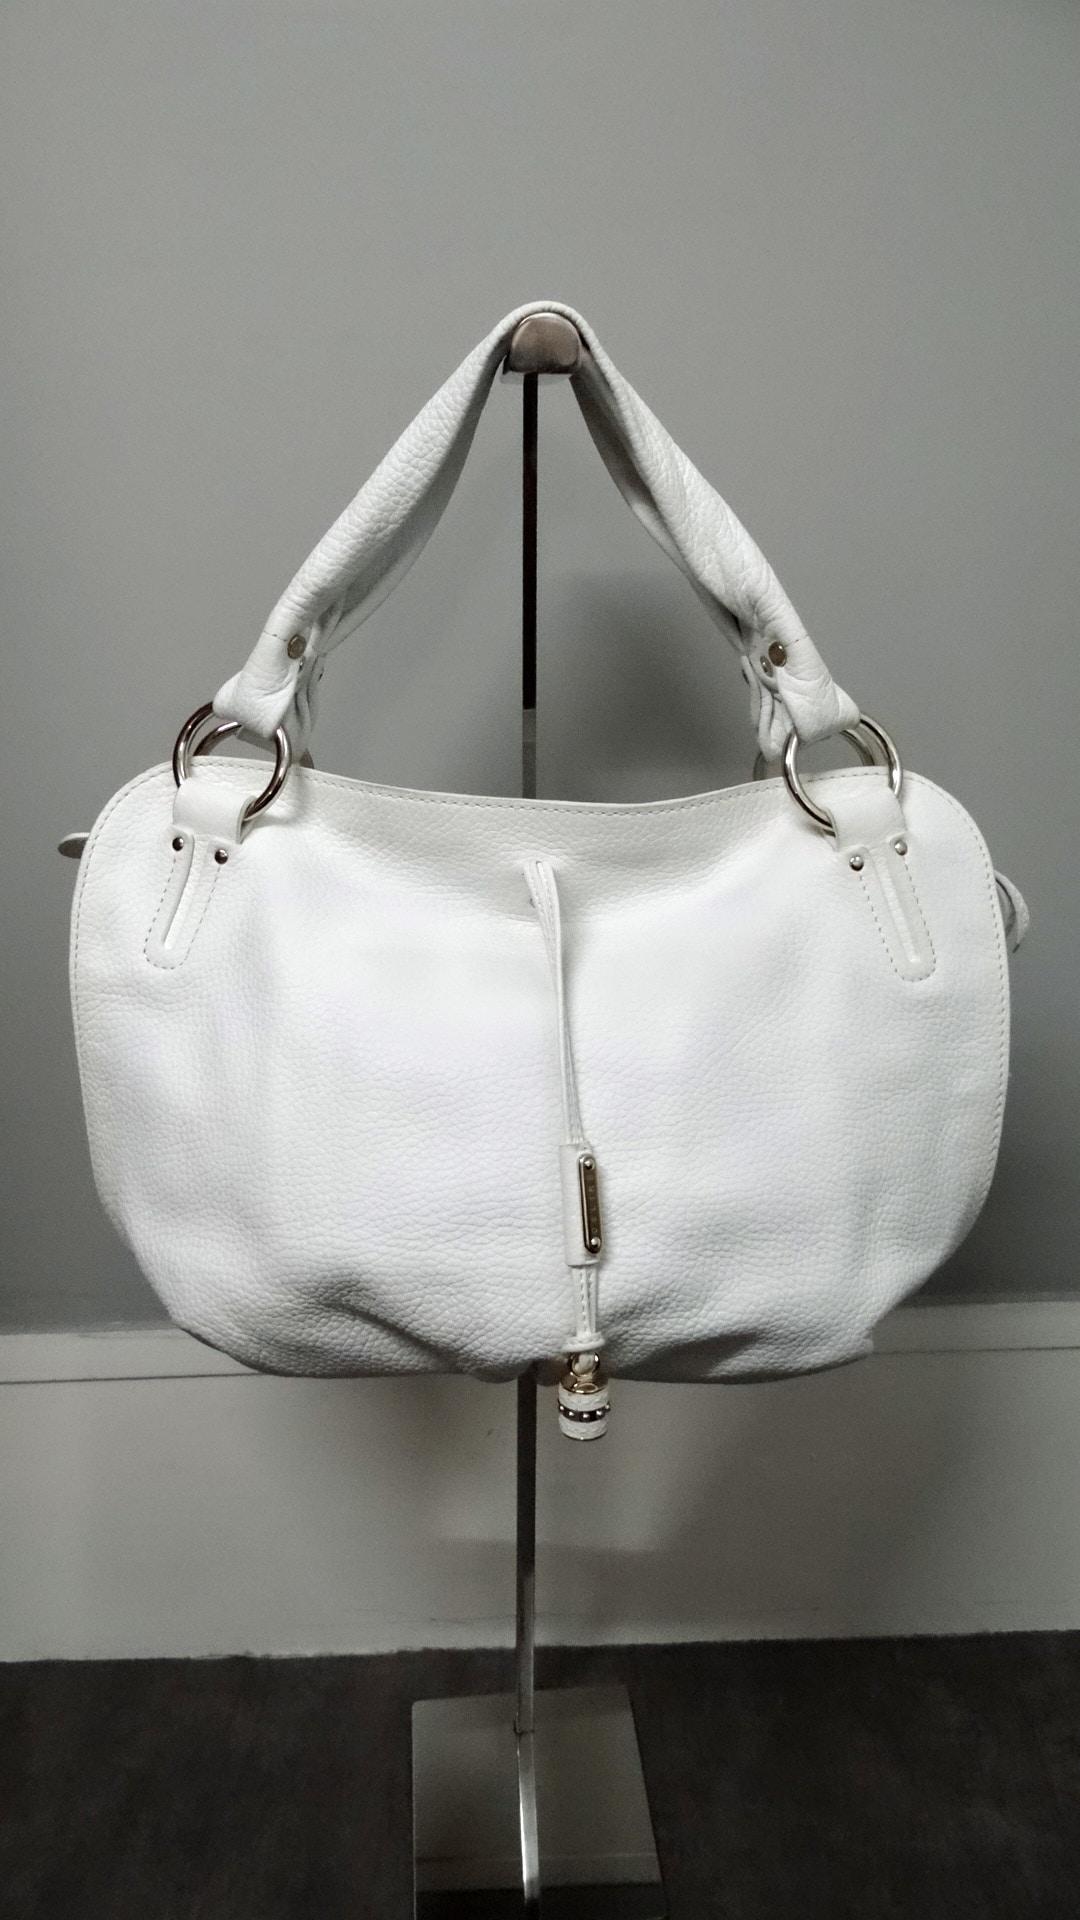 Blanc Sac Celine Neuf Cuir Comme uFKT13lJc5